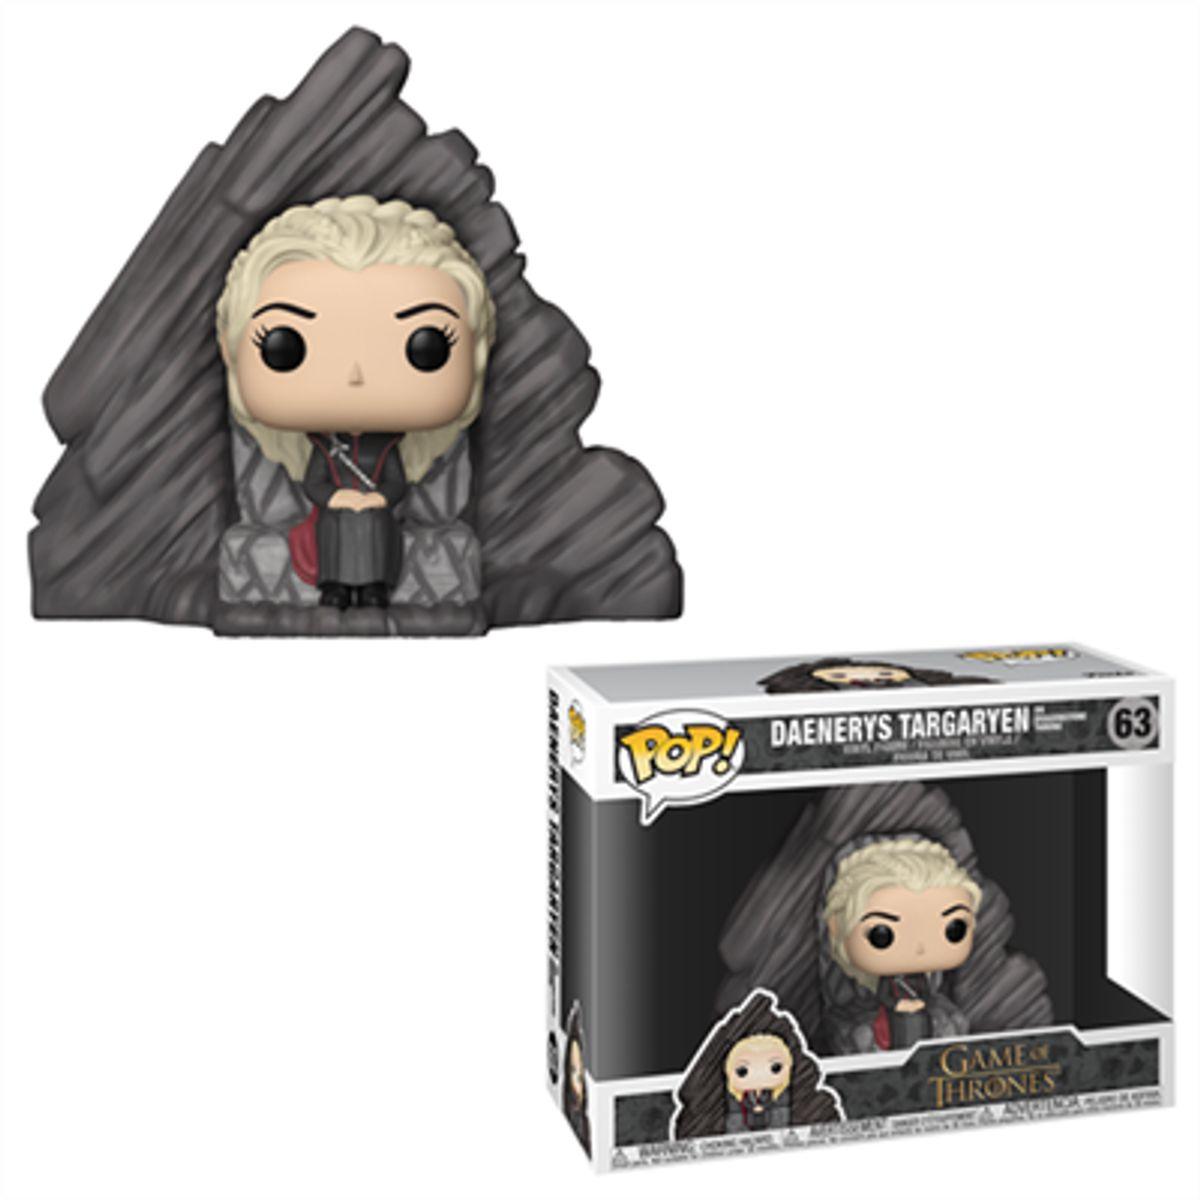 Funko Pop! Deluxe Game of Thrones Daenerys Targaryen on Dragonstone Throne